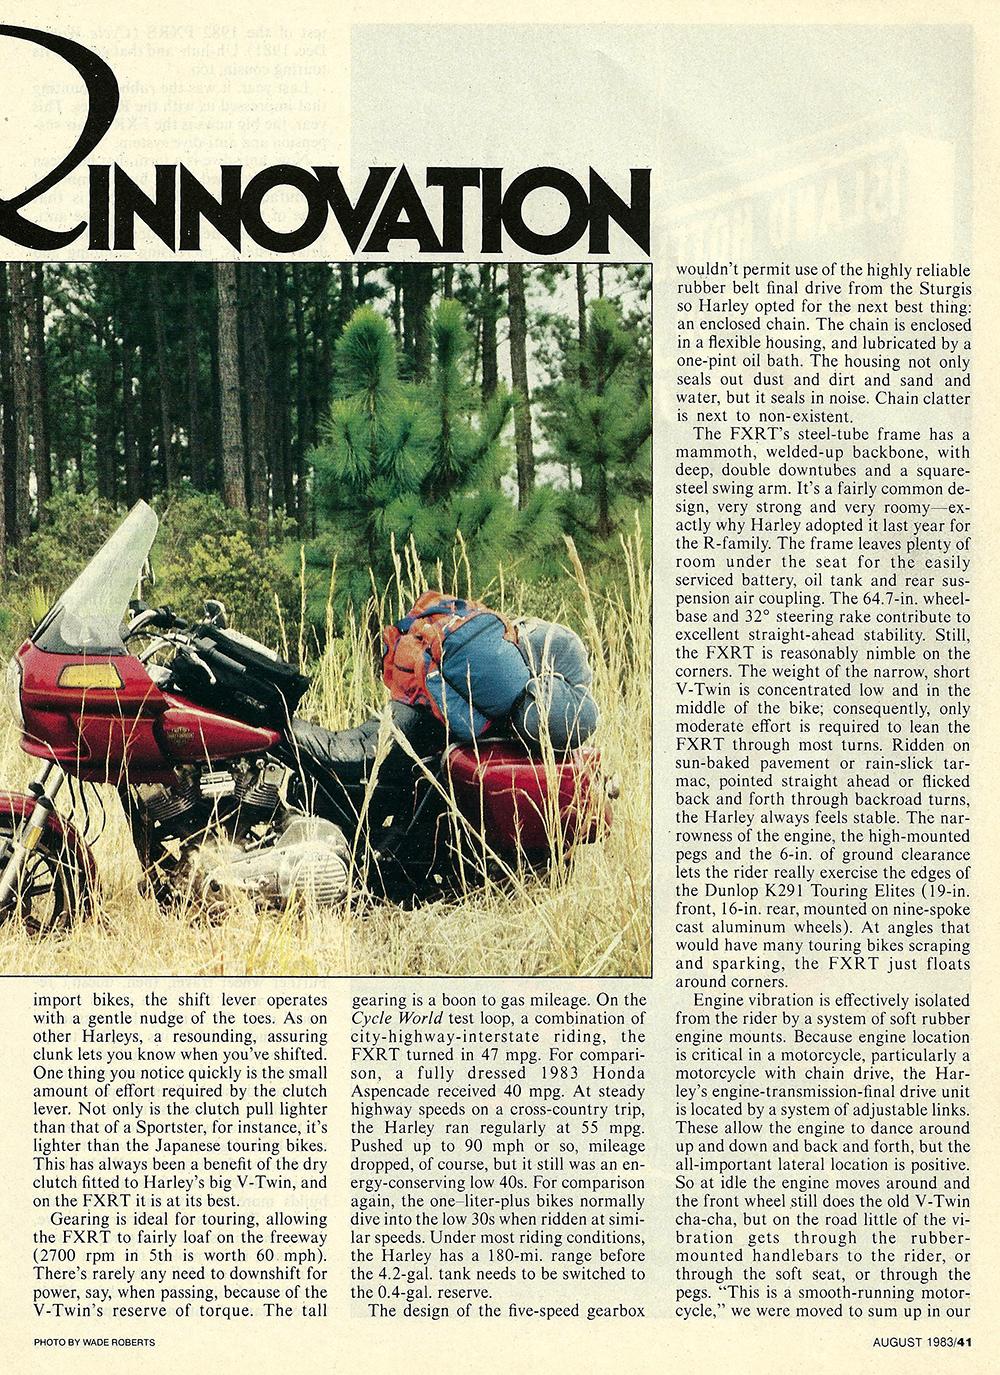 1983 Harley-Davidson FXRT road test 02.jpg